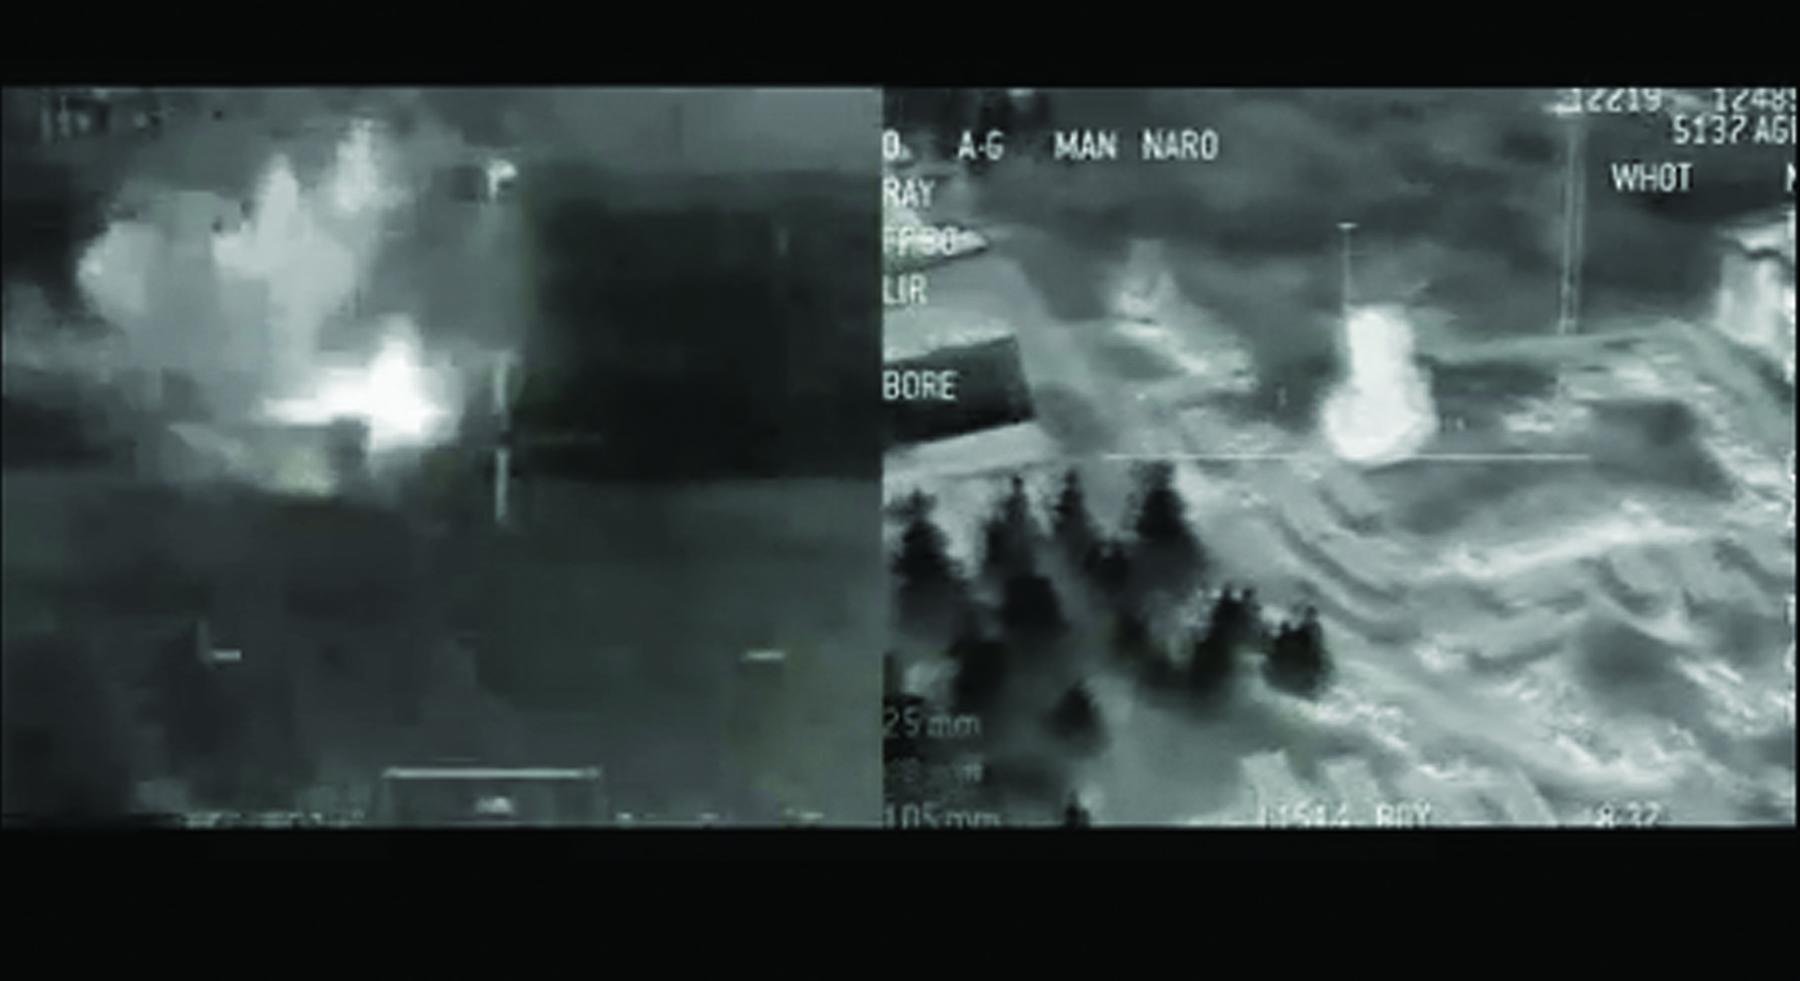 Josh Bricker, Post Newtonianism (War Footage/Call of Duty 4 Modern Warfare) ,2010,Digital video, sound, color,5' 32''